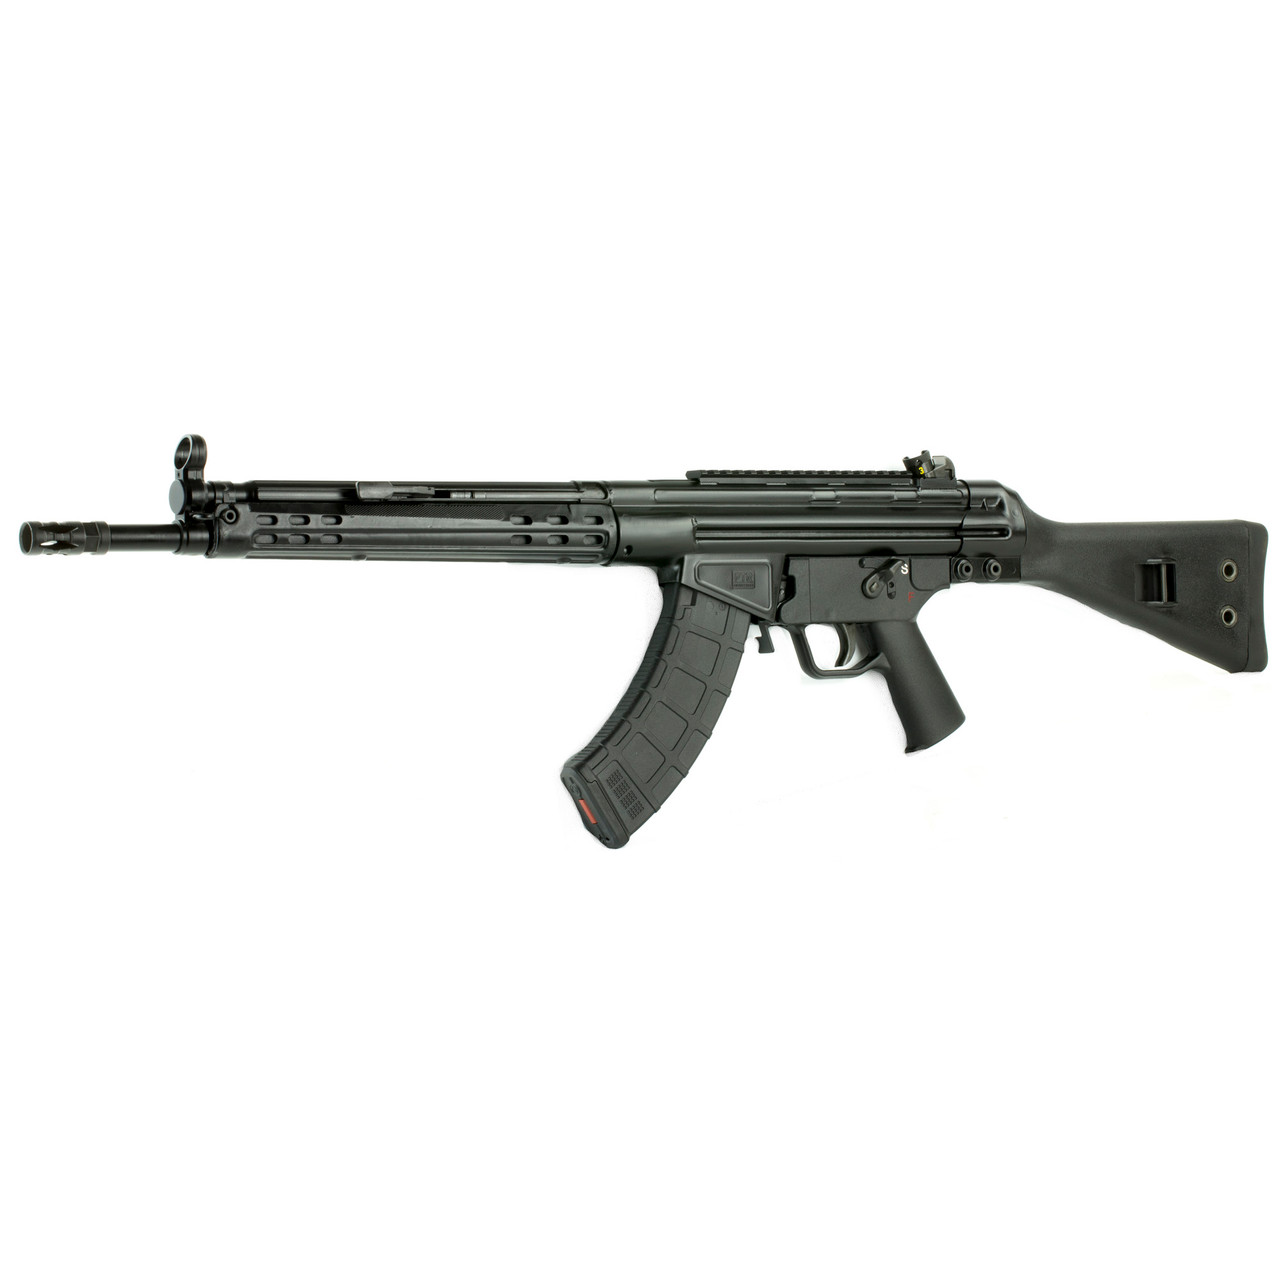 "PTR 32 KFR 7.62x39 16"" Rifle"